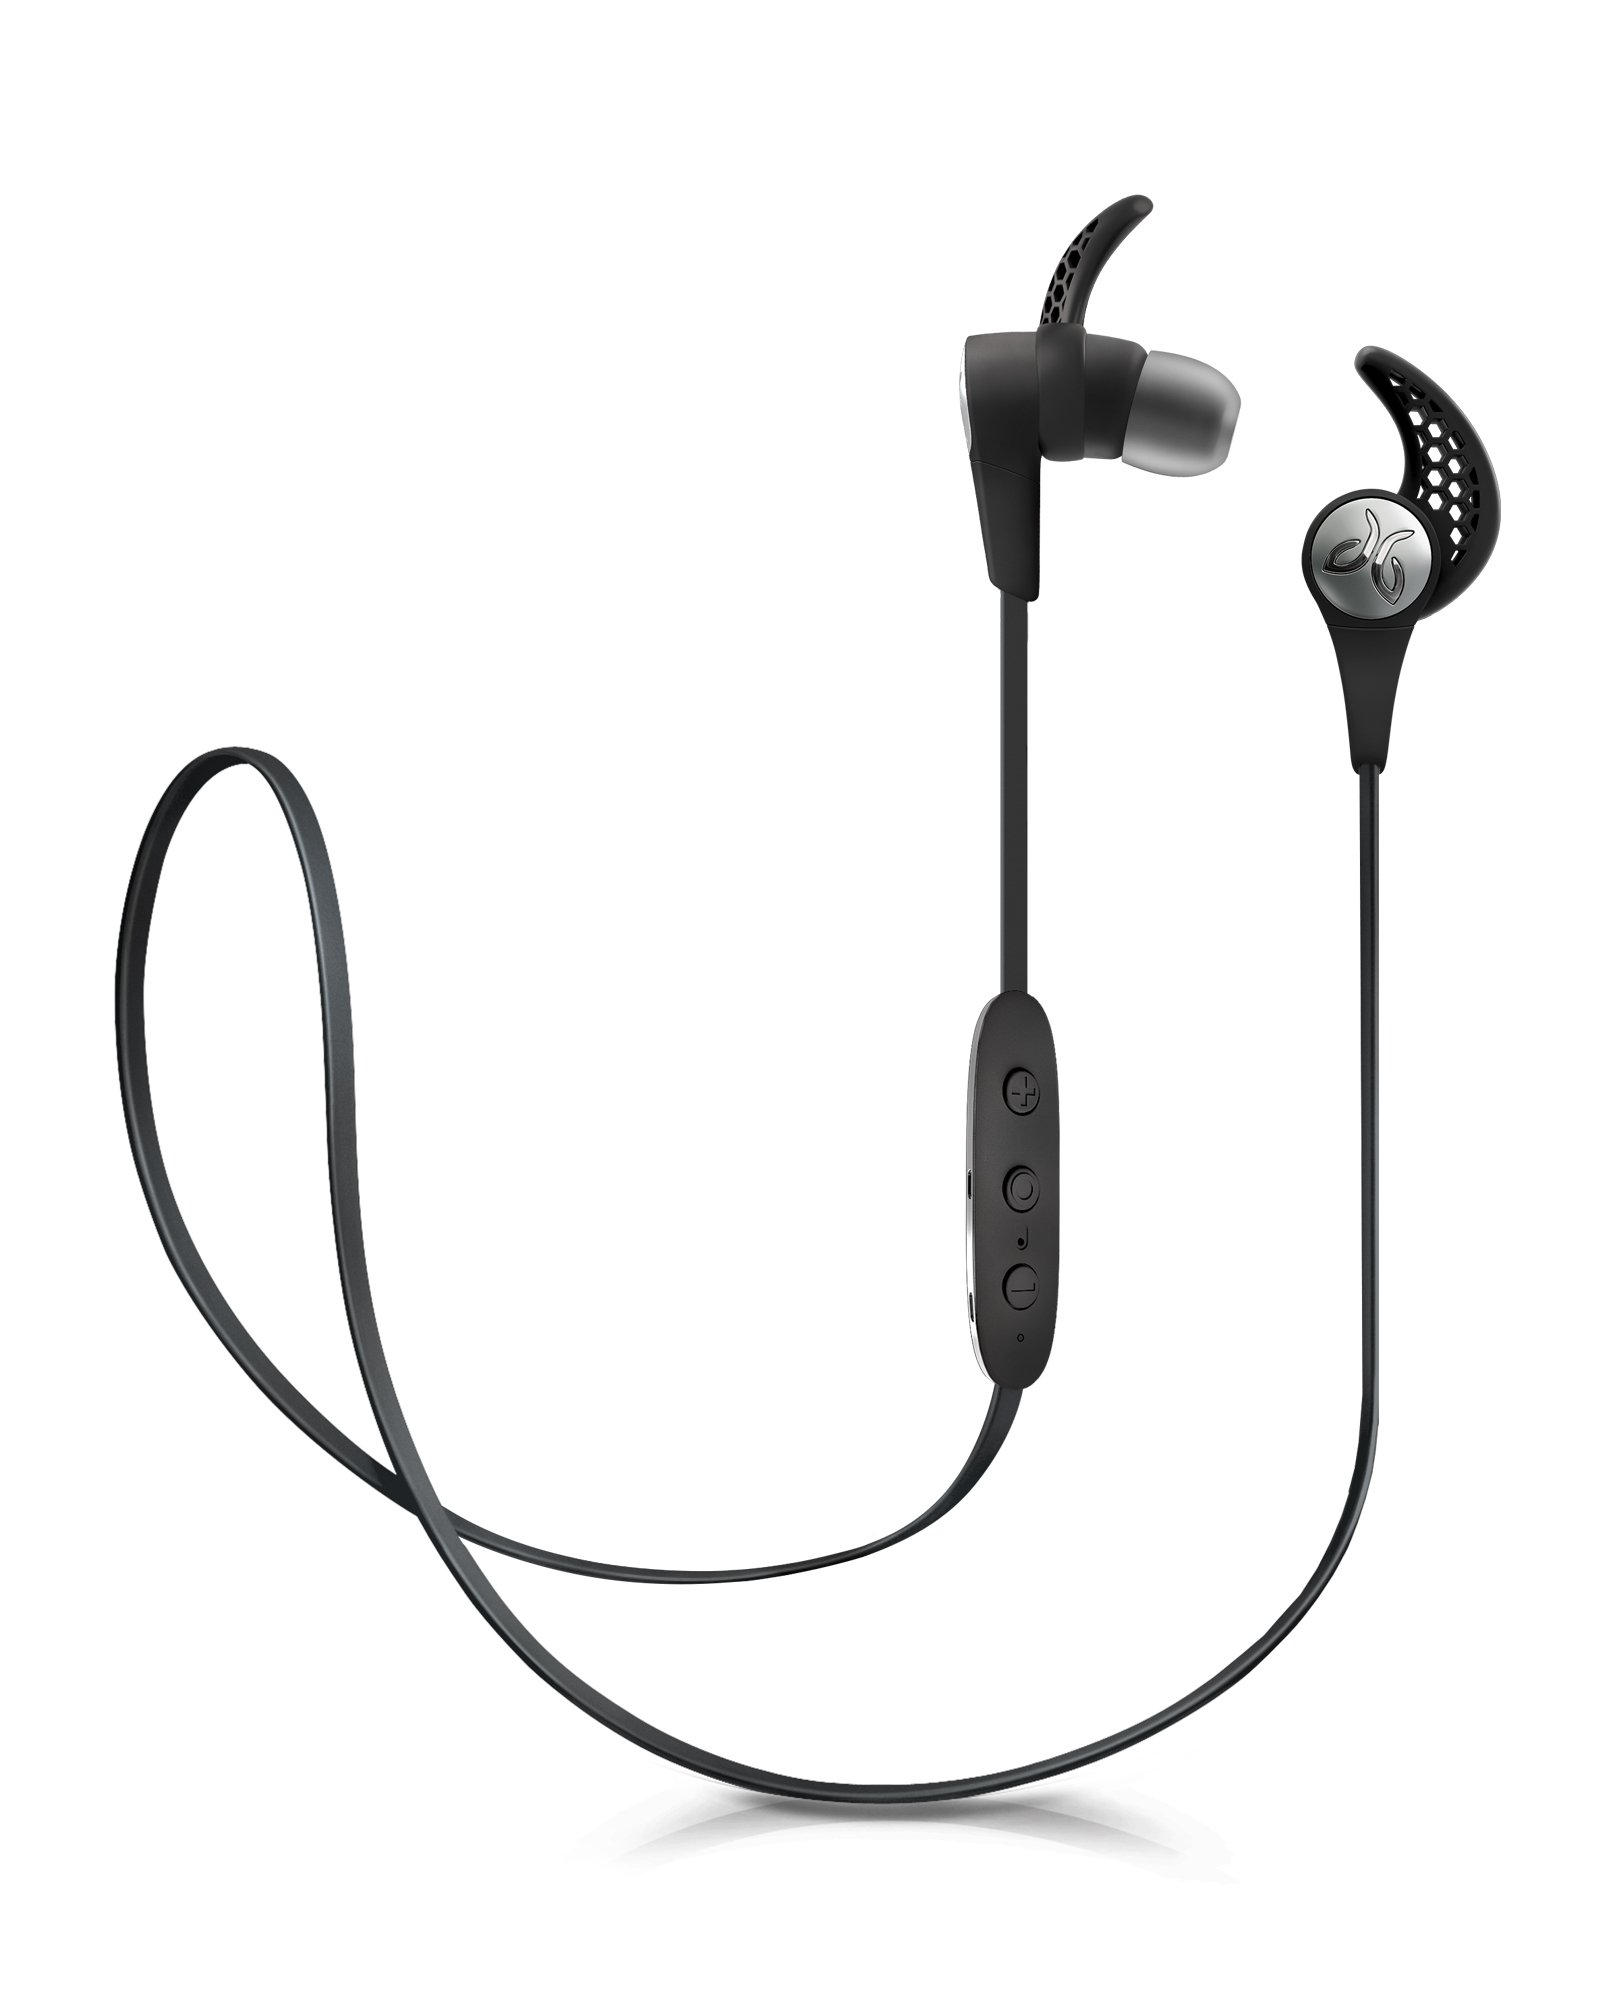 Jaybird X3 in-Ear Wireless Bluetooth Sports Headphones – Sweat-Proof – Universal Fit – 8 Hours Battery Life – Blackout